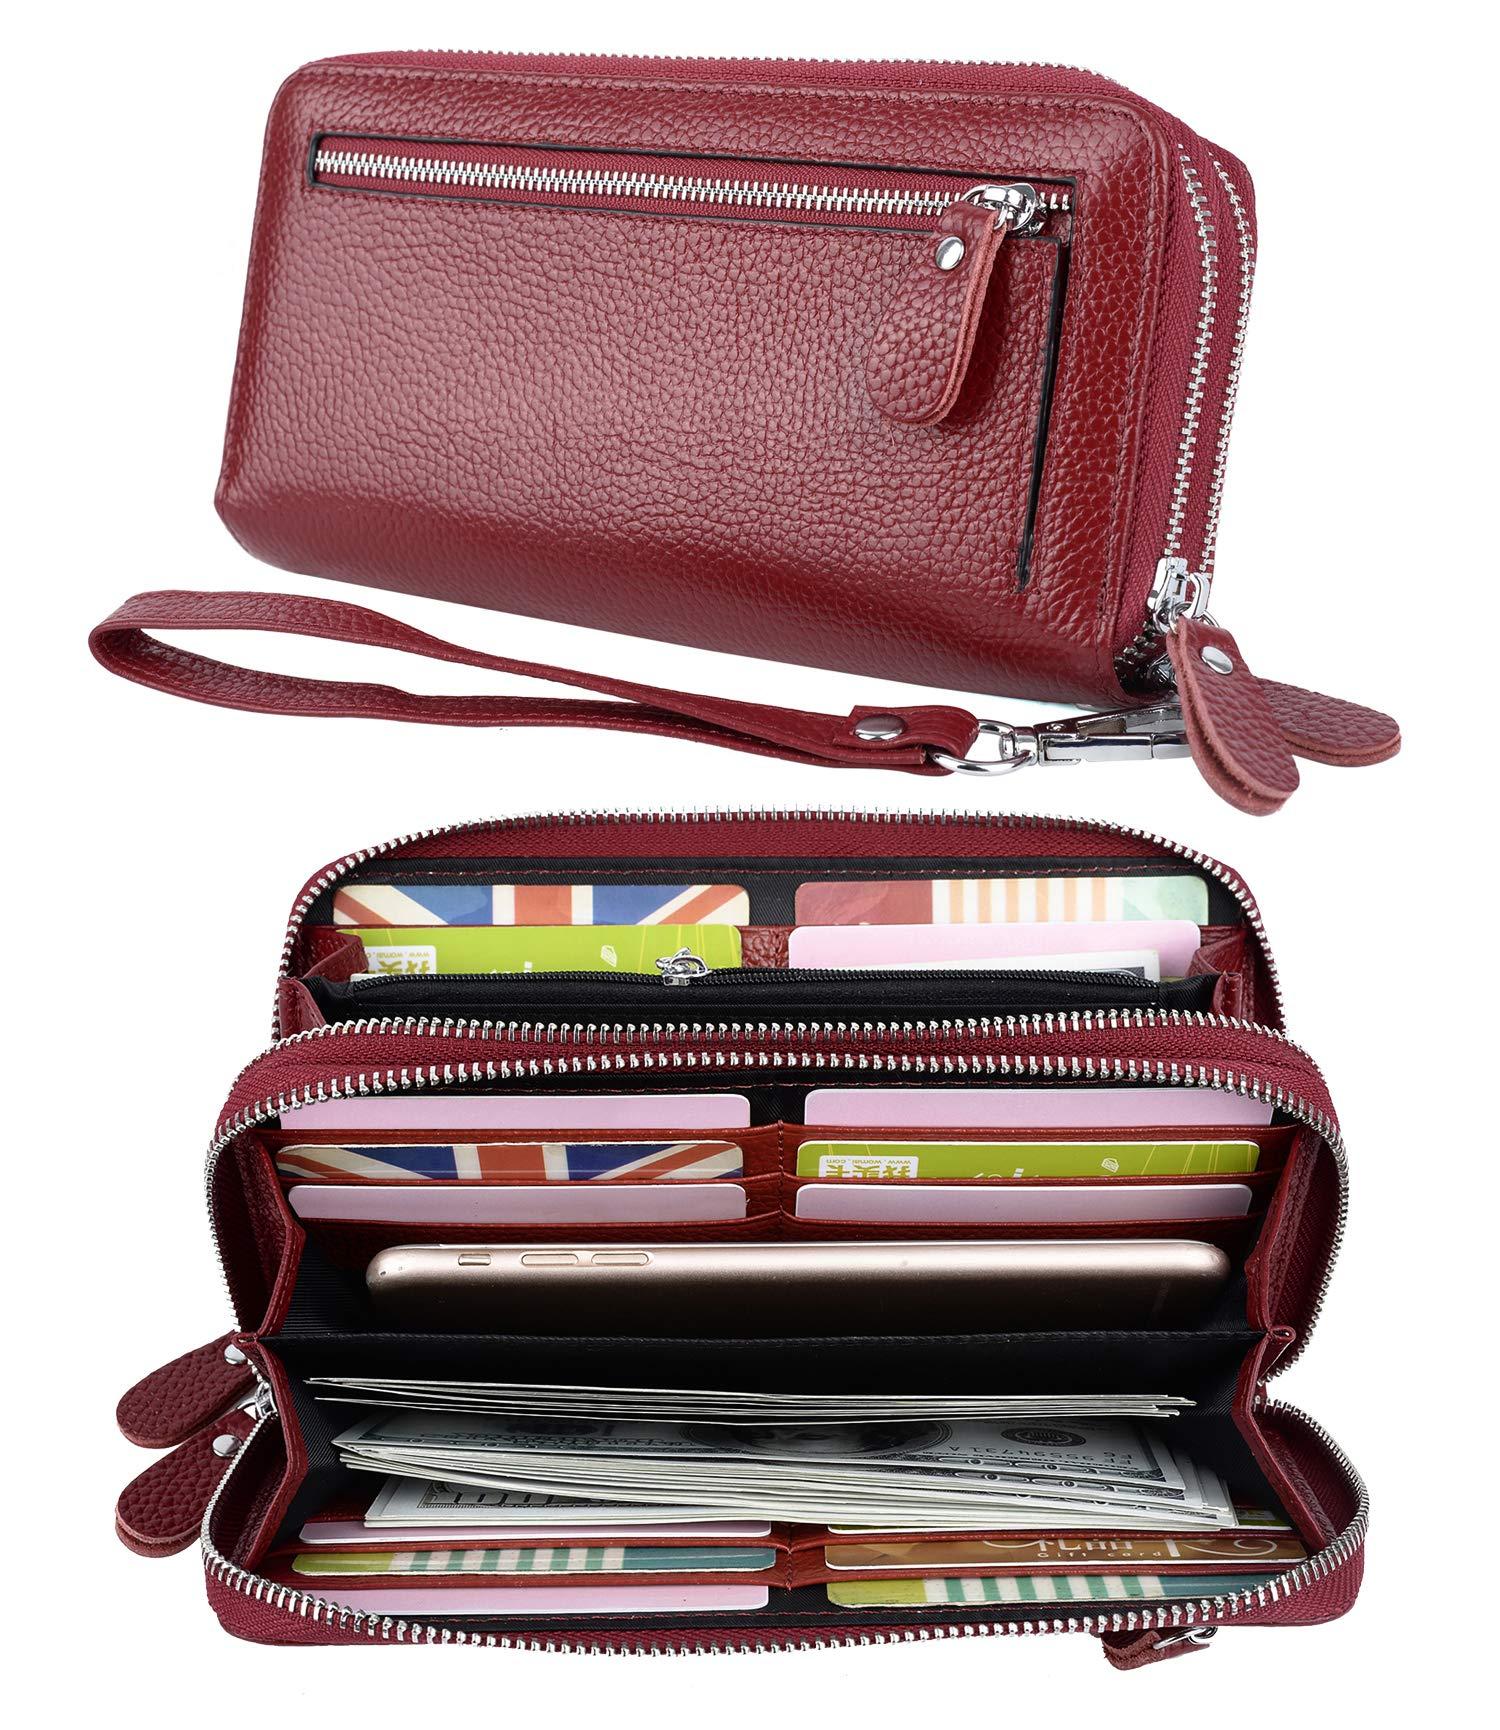 YALUXE Women's RFID Blocking Security Double Zipper Large Smartphone Wristlet Leather Wallet Red